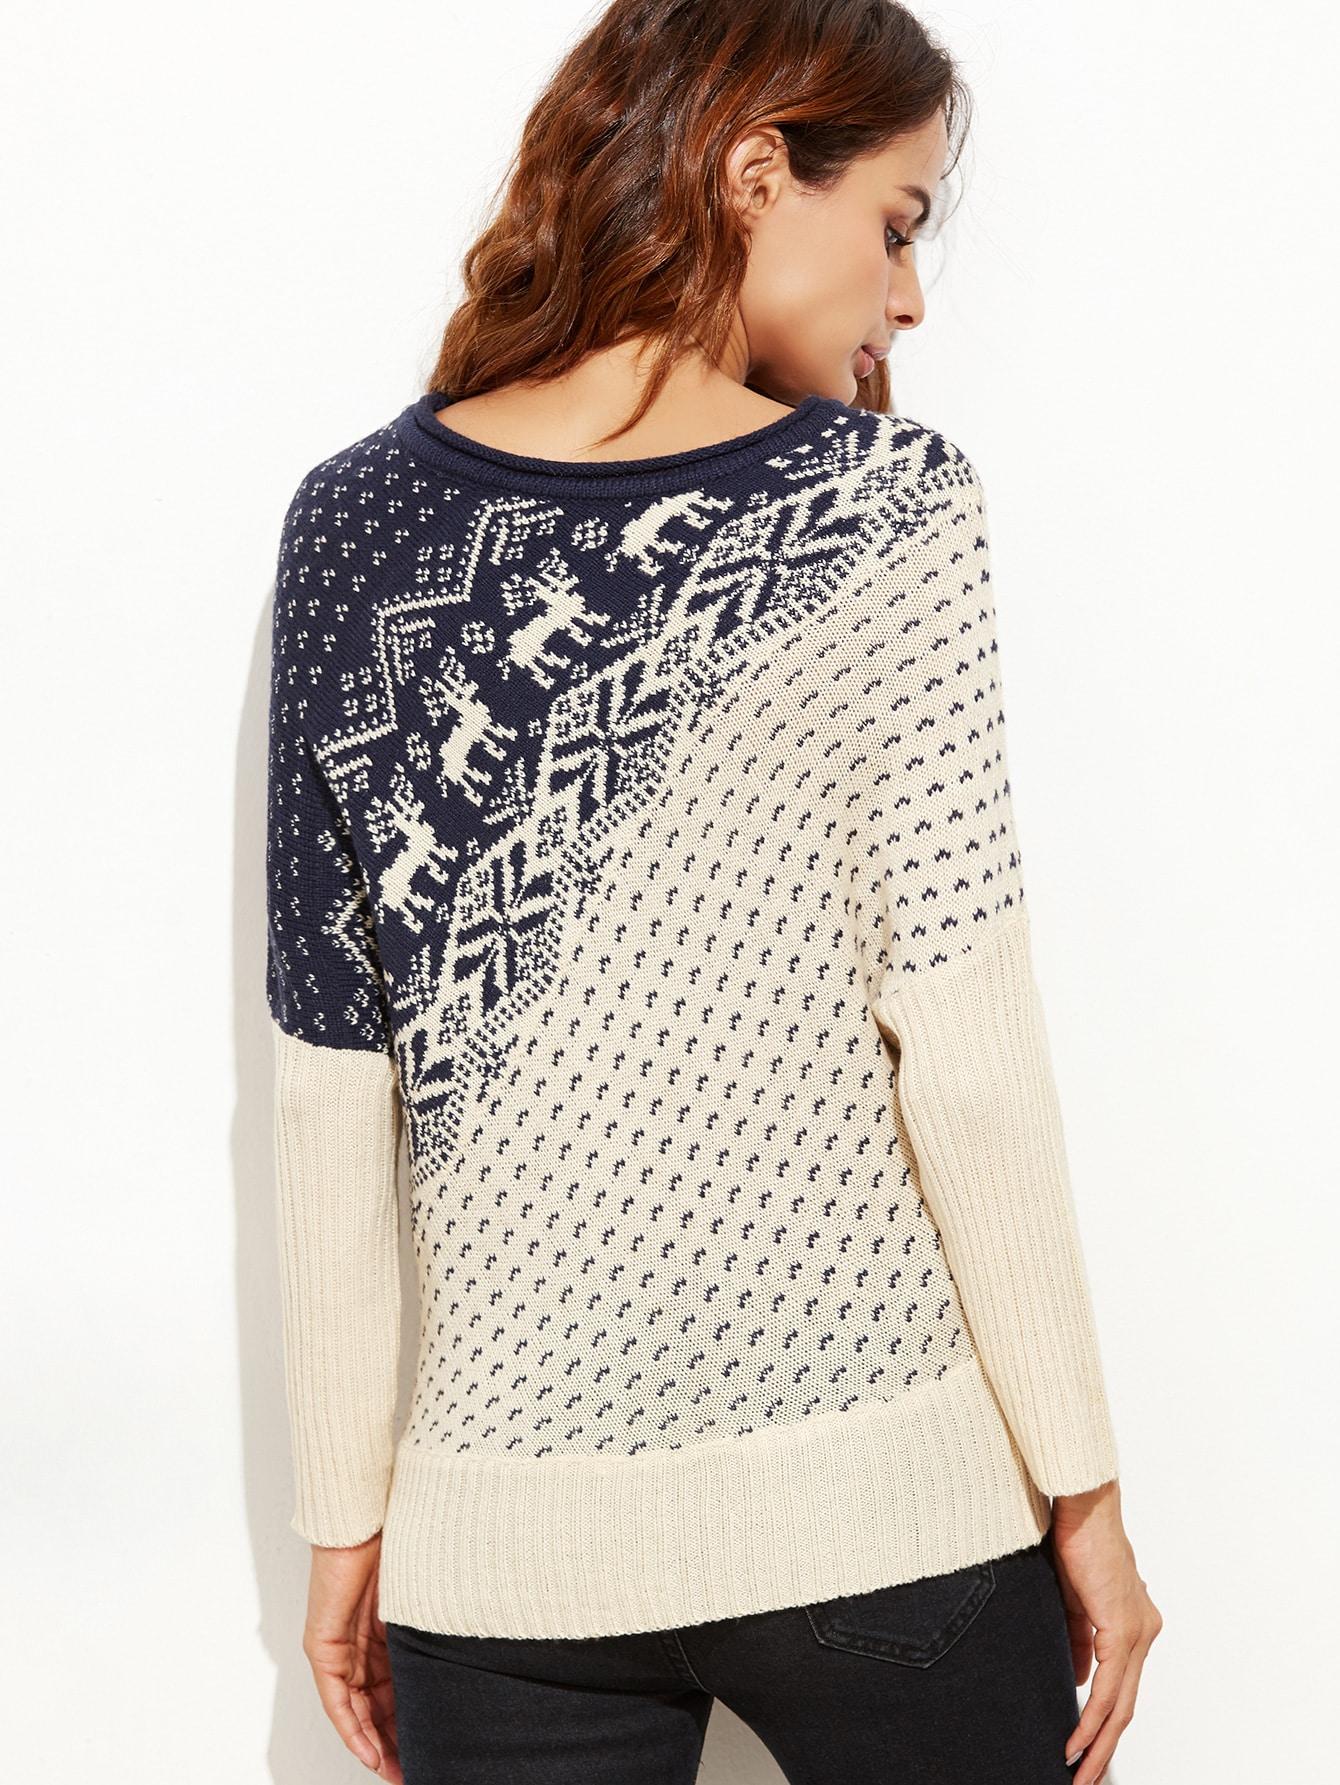 sweater160928454_3